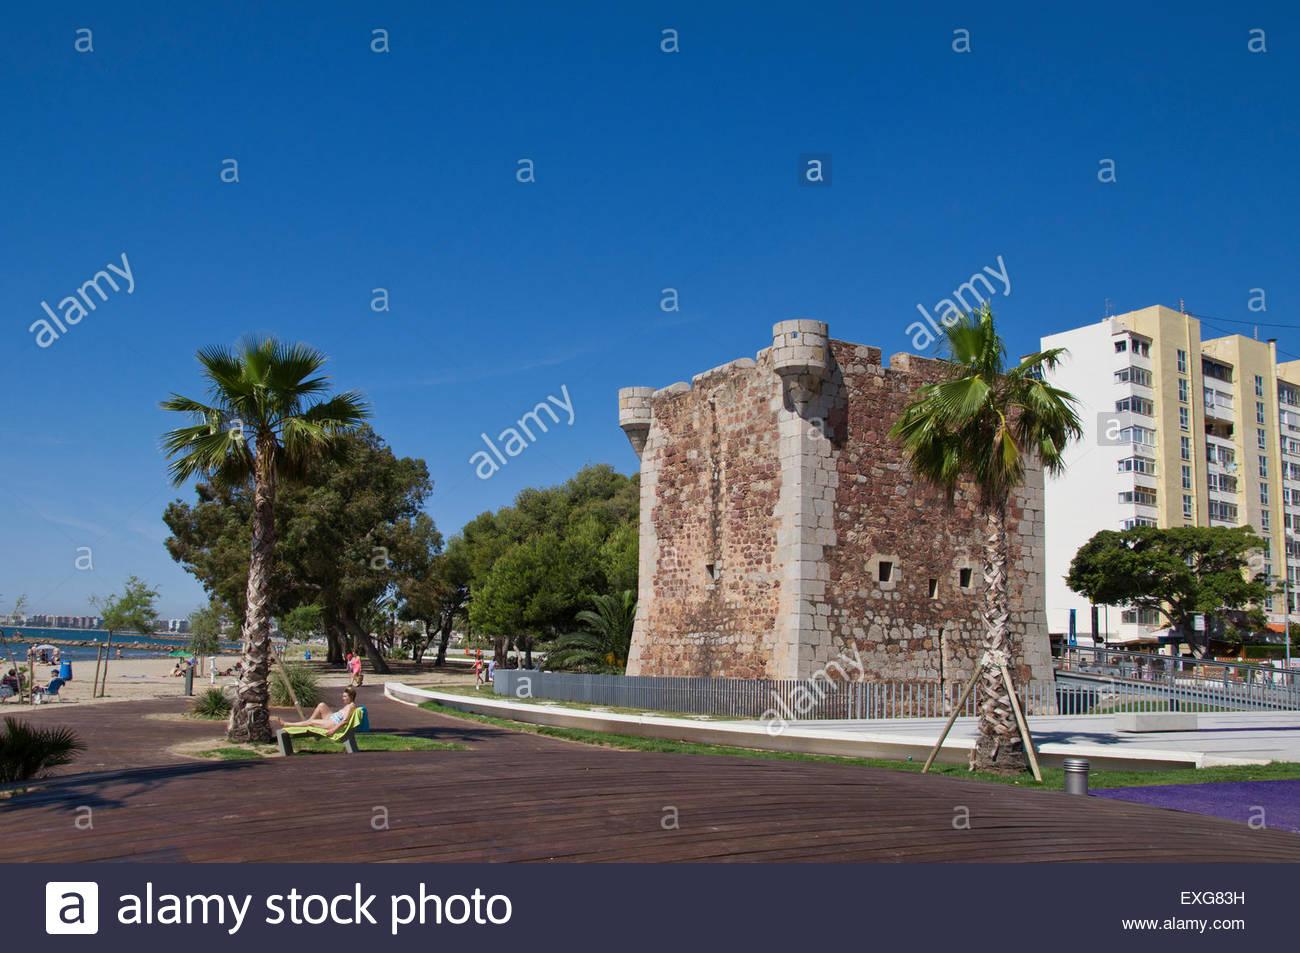 castelln de la plana divorced singles Visit the most famous monuments in castellón de la plana, valencian community - valencia region get to know the rich historical and cultural past of the region.